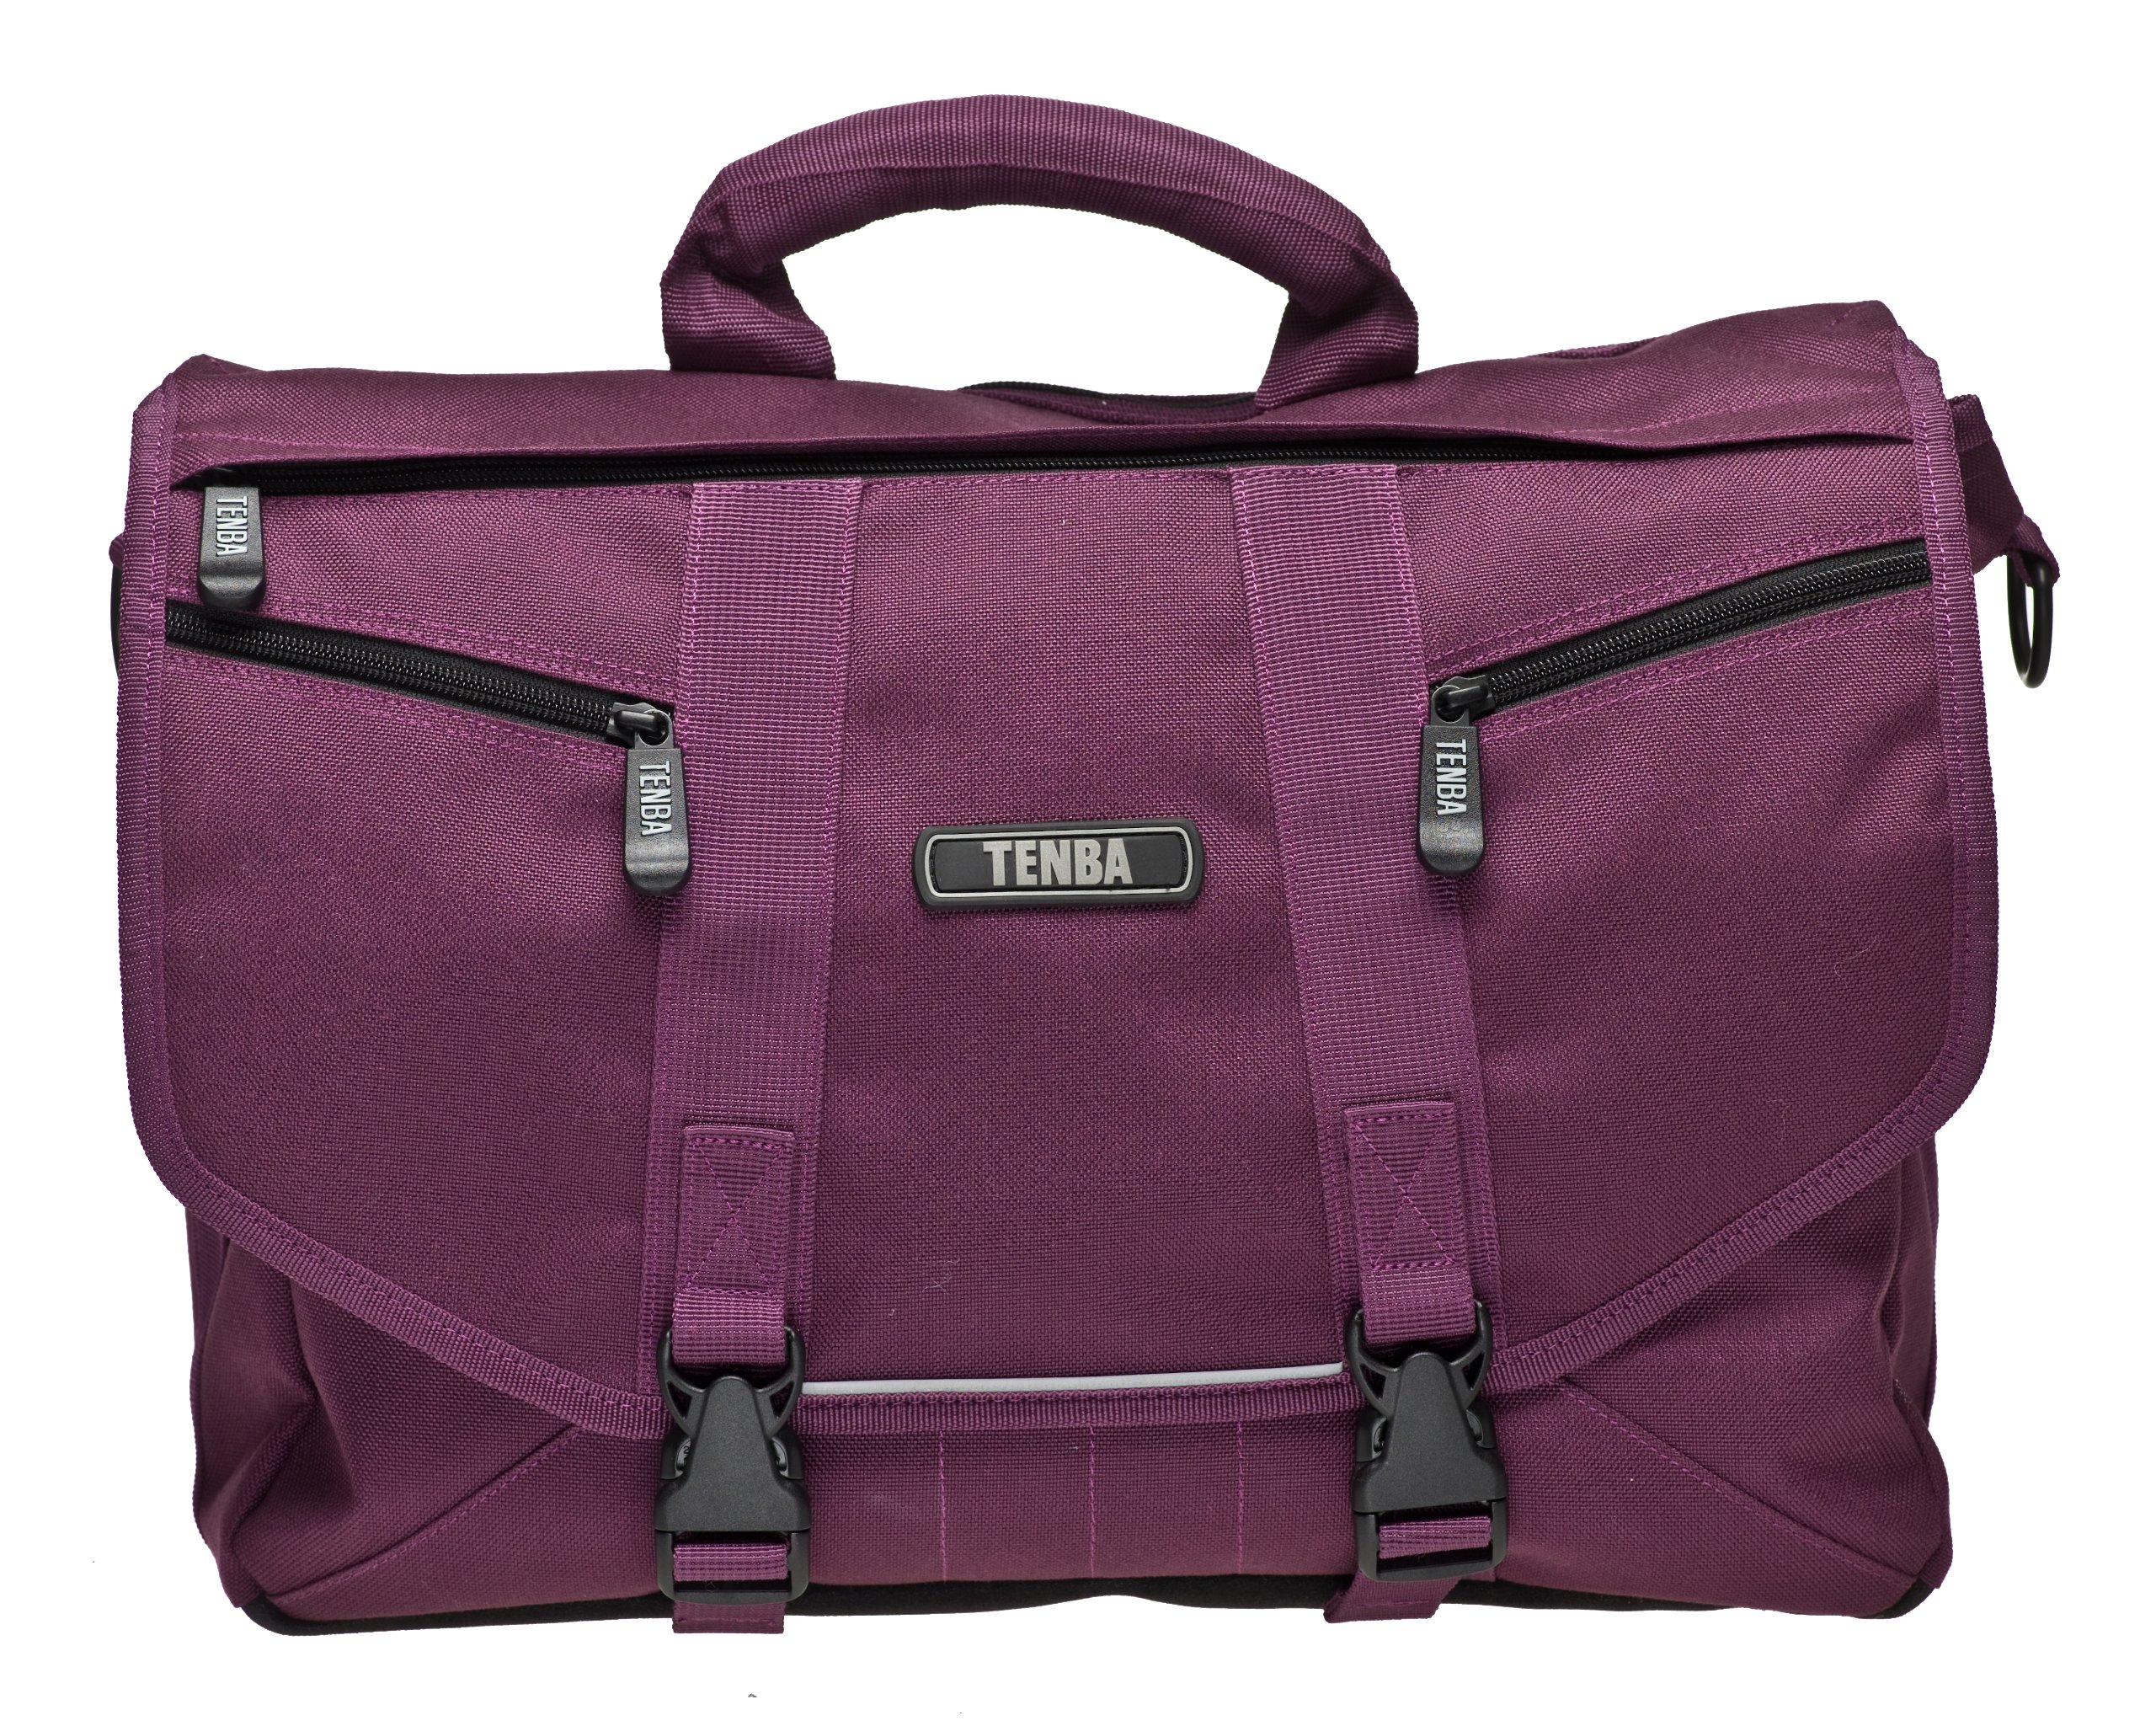 Tenba Messenger Small Photo/Laptop Bag - Plum (638-226)